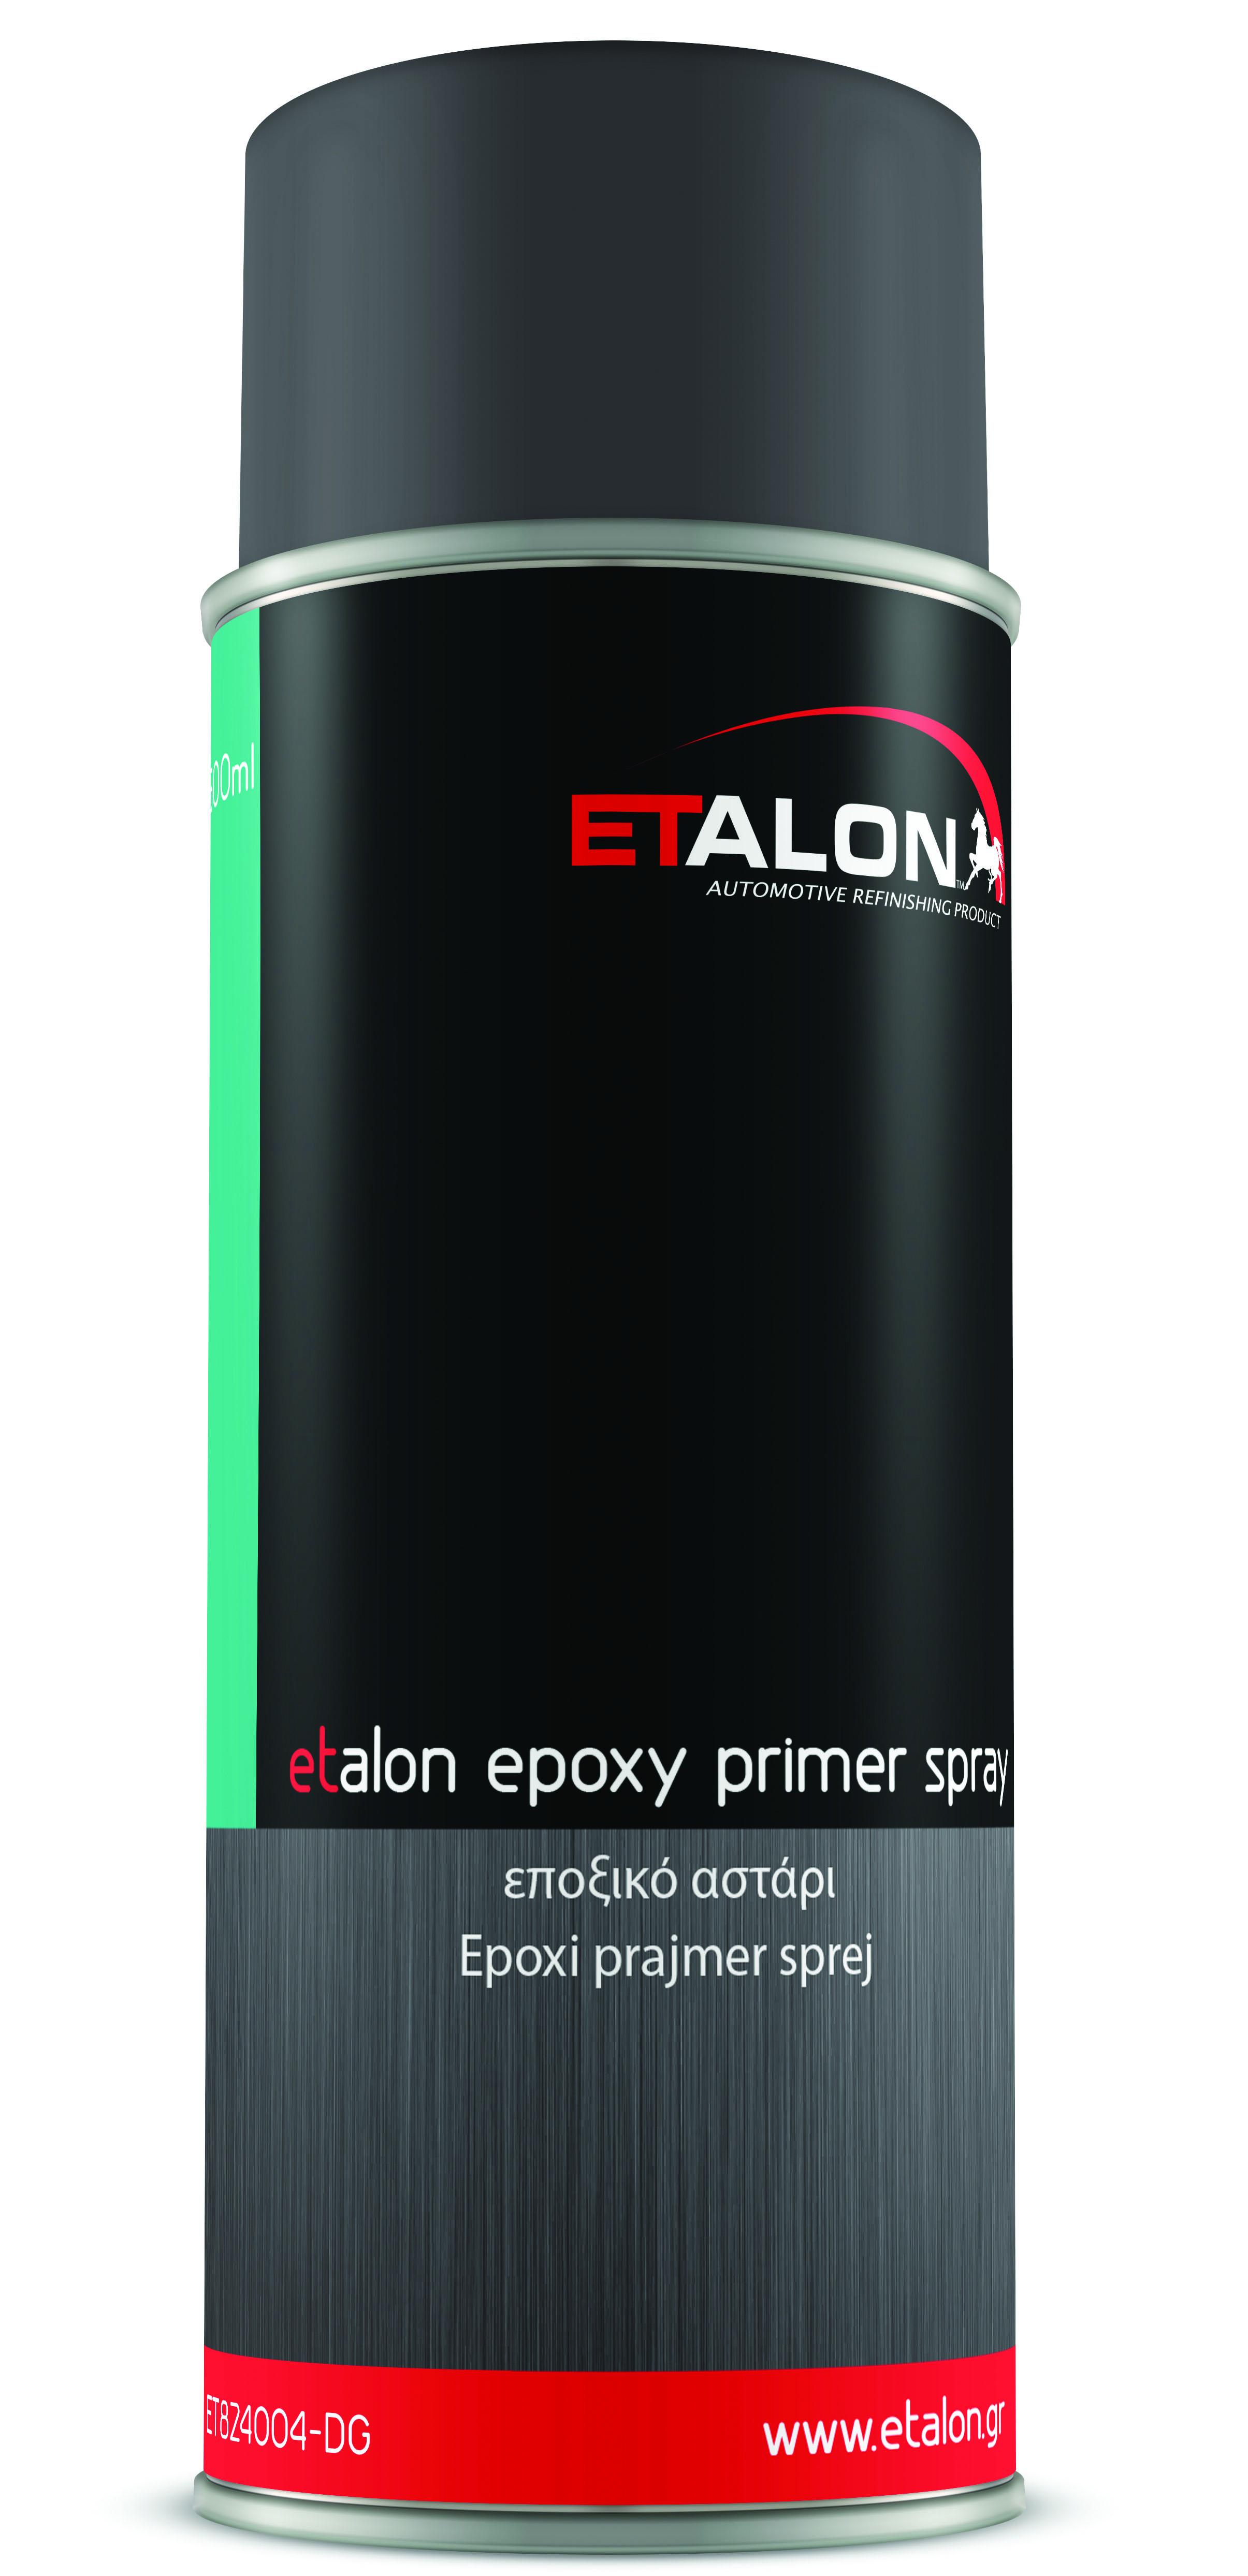 fanovafes.com.gr_epoxy primer spray DG